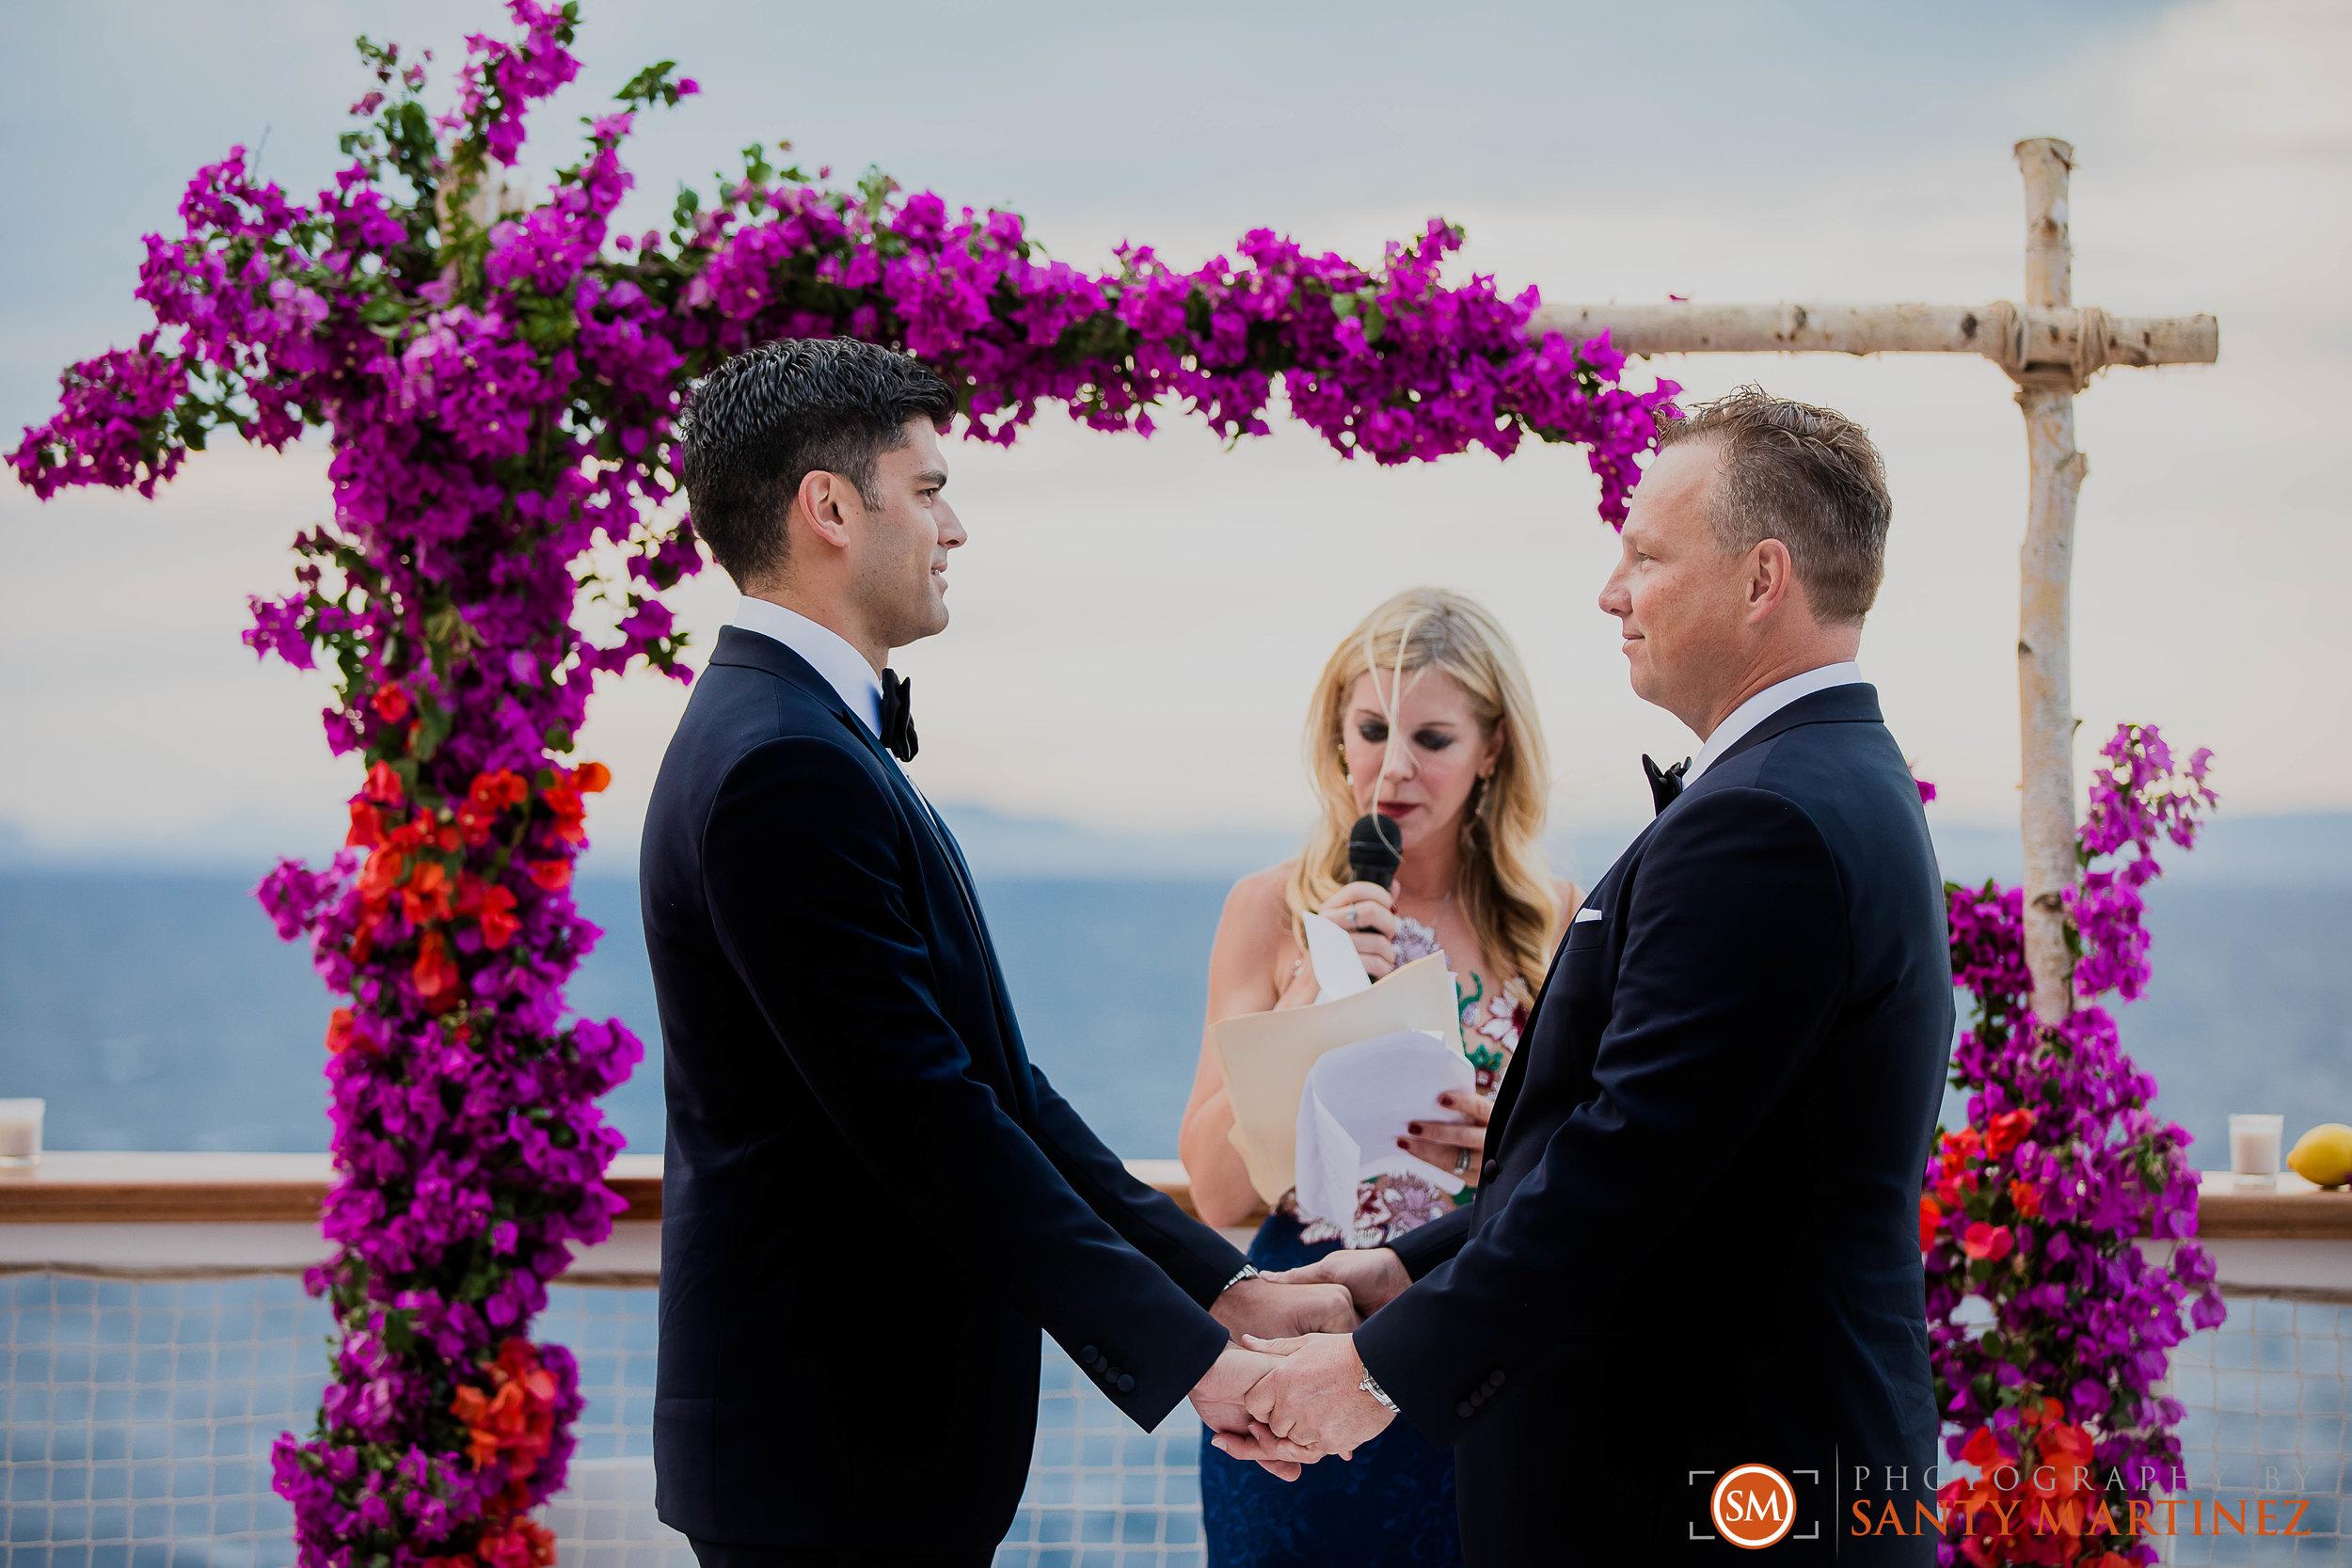 Wedding Capri Italy - Photography by Santy Martinez-53.jpg